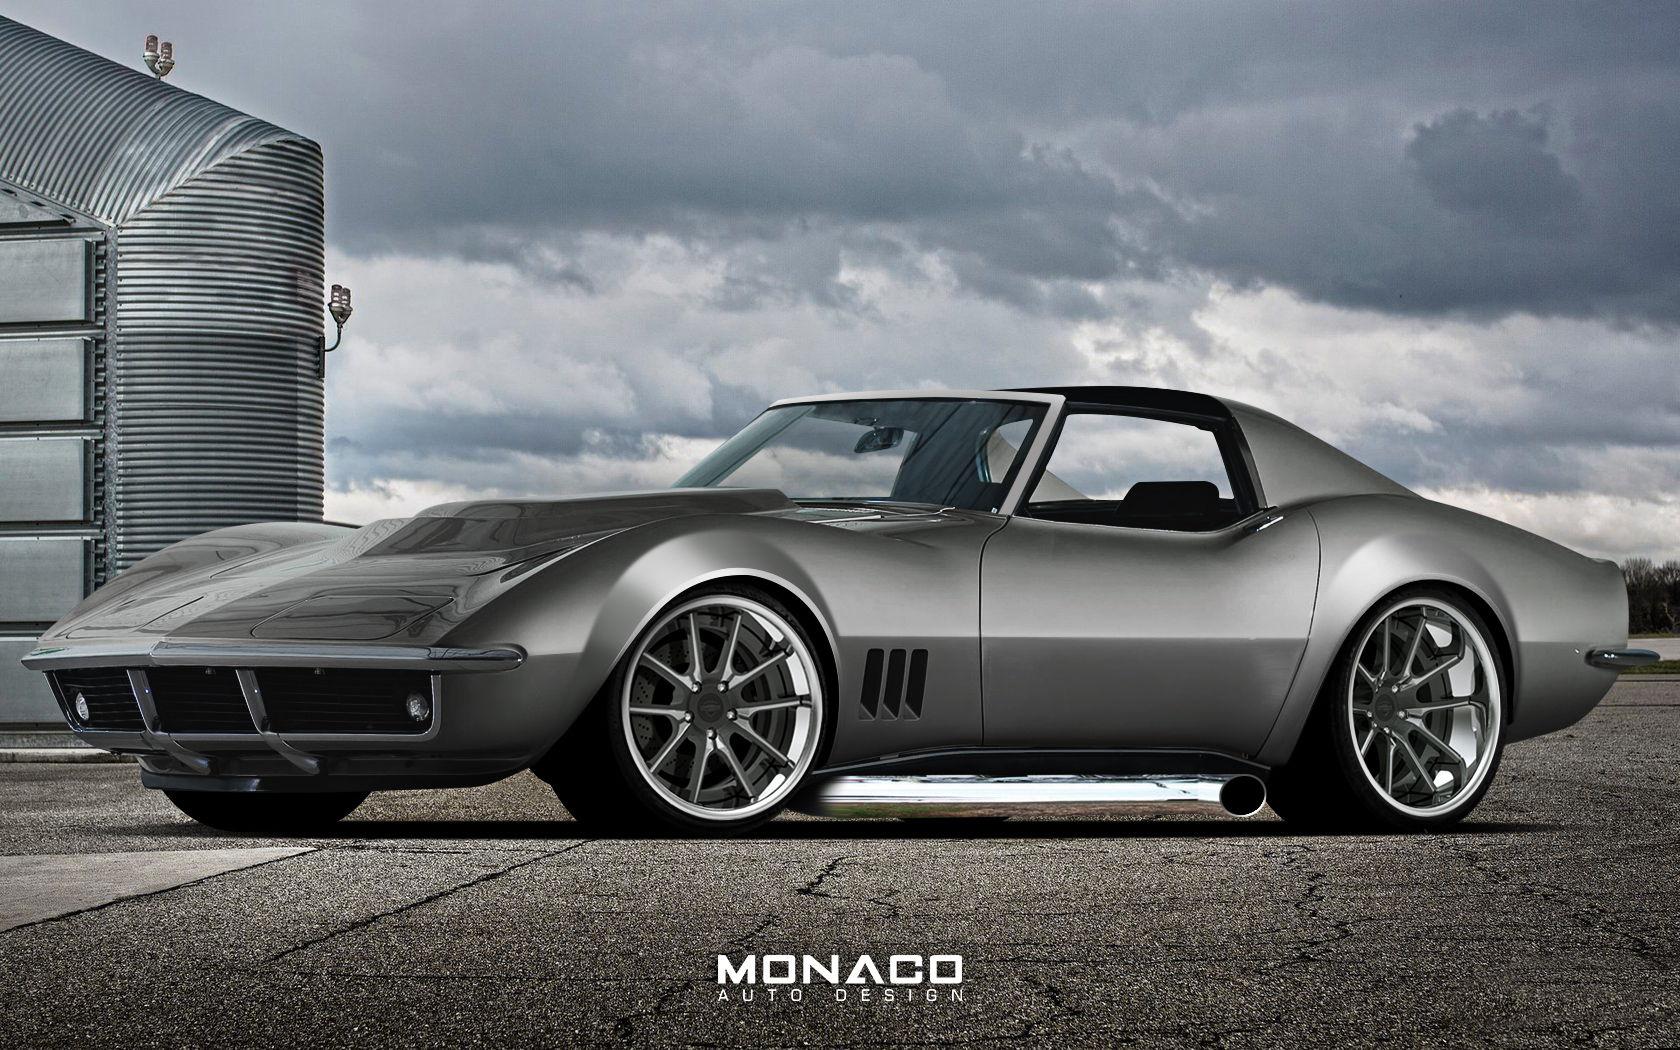 Rendering Amp Design For Your Corvette 20 Off